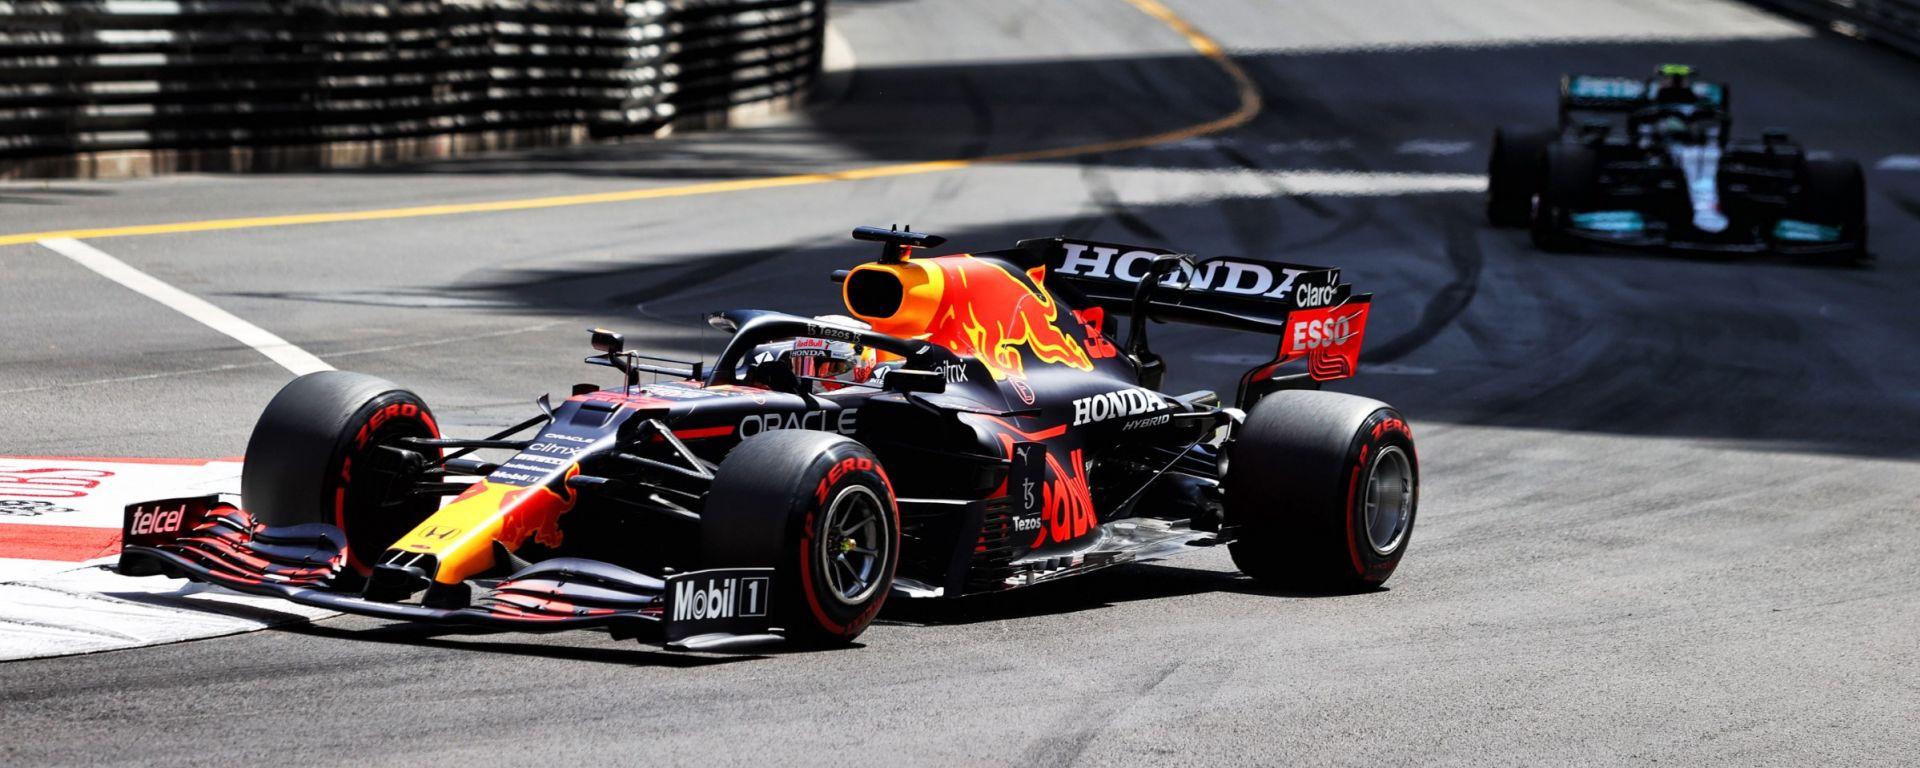 F1, GP Monaco 2021: Max Verstappen (Red Bull)